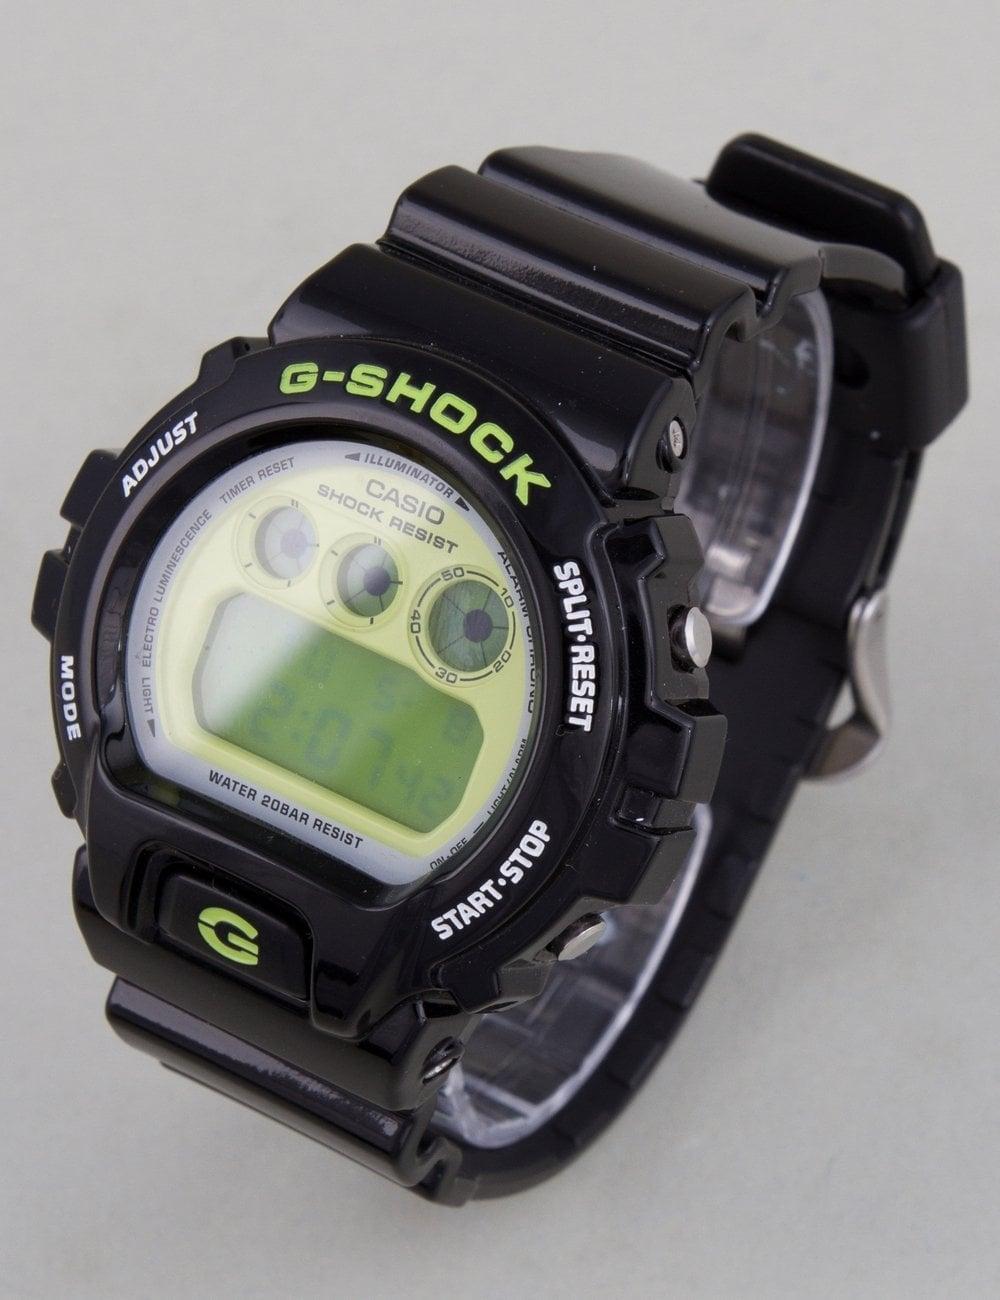 size 40 846c2 8c86a G-Shock DW-6900CS-1ER Watch - Black Green